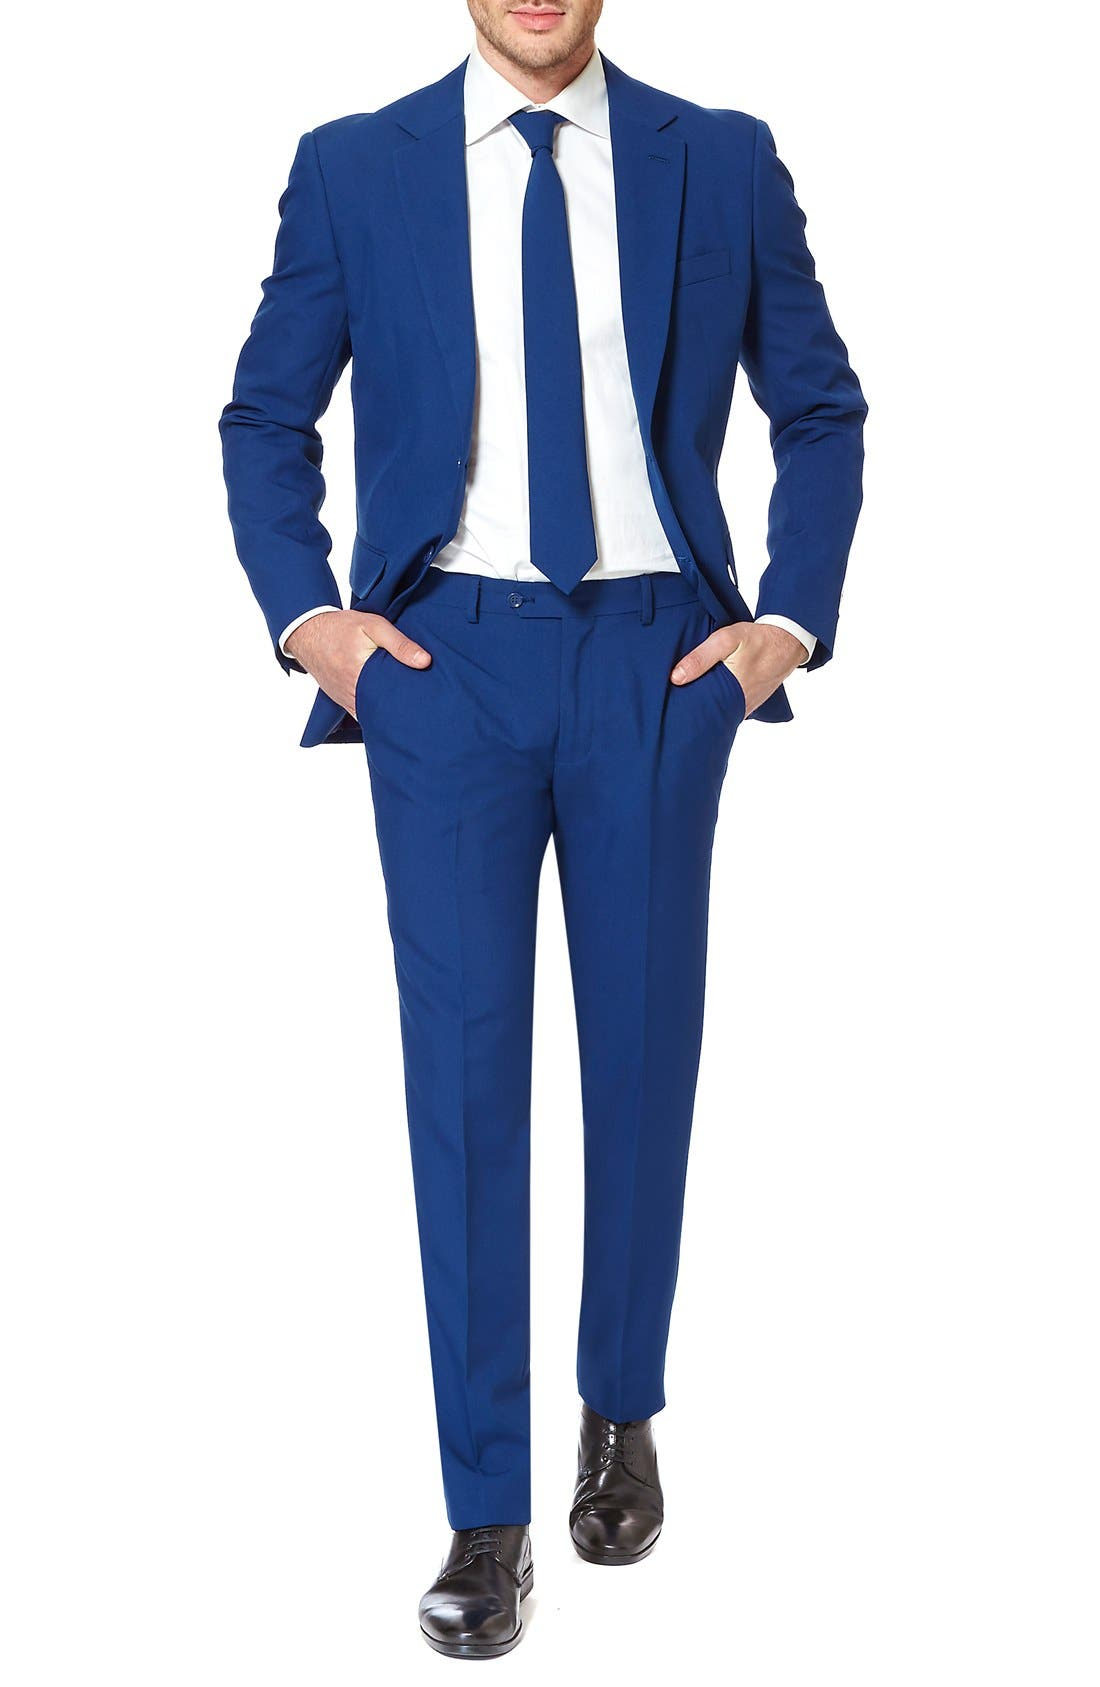 'Navy Royale' Trim Fit Two-Piece Suit with Tie,                             Main thumbnail 1, color,                             410